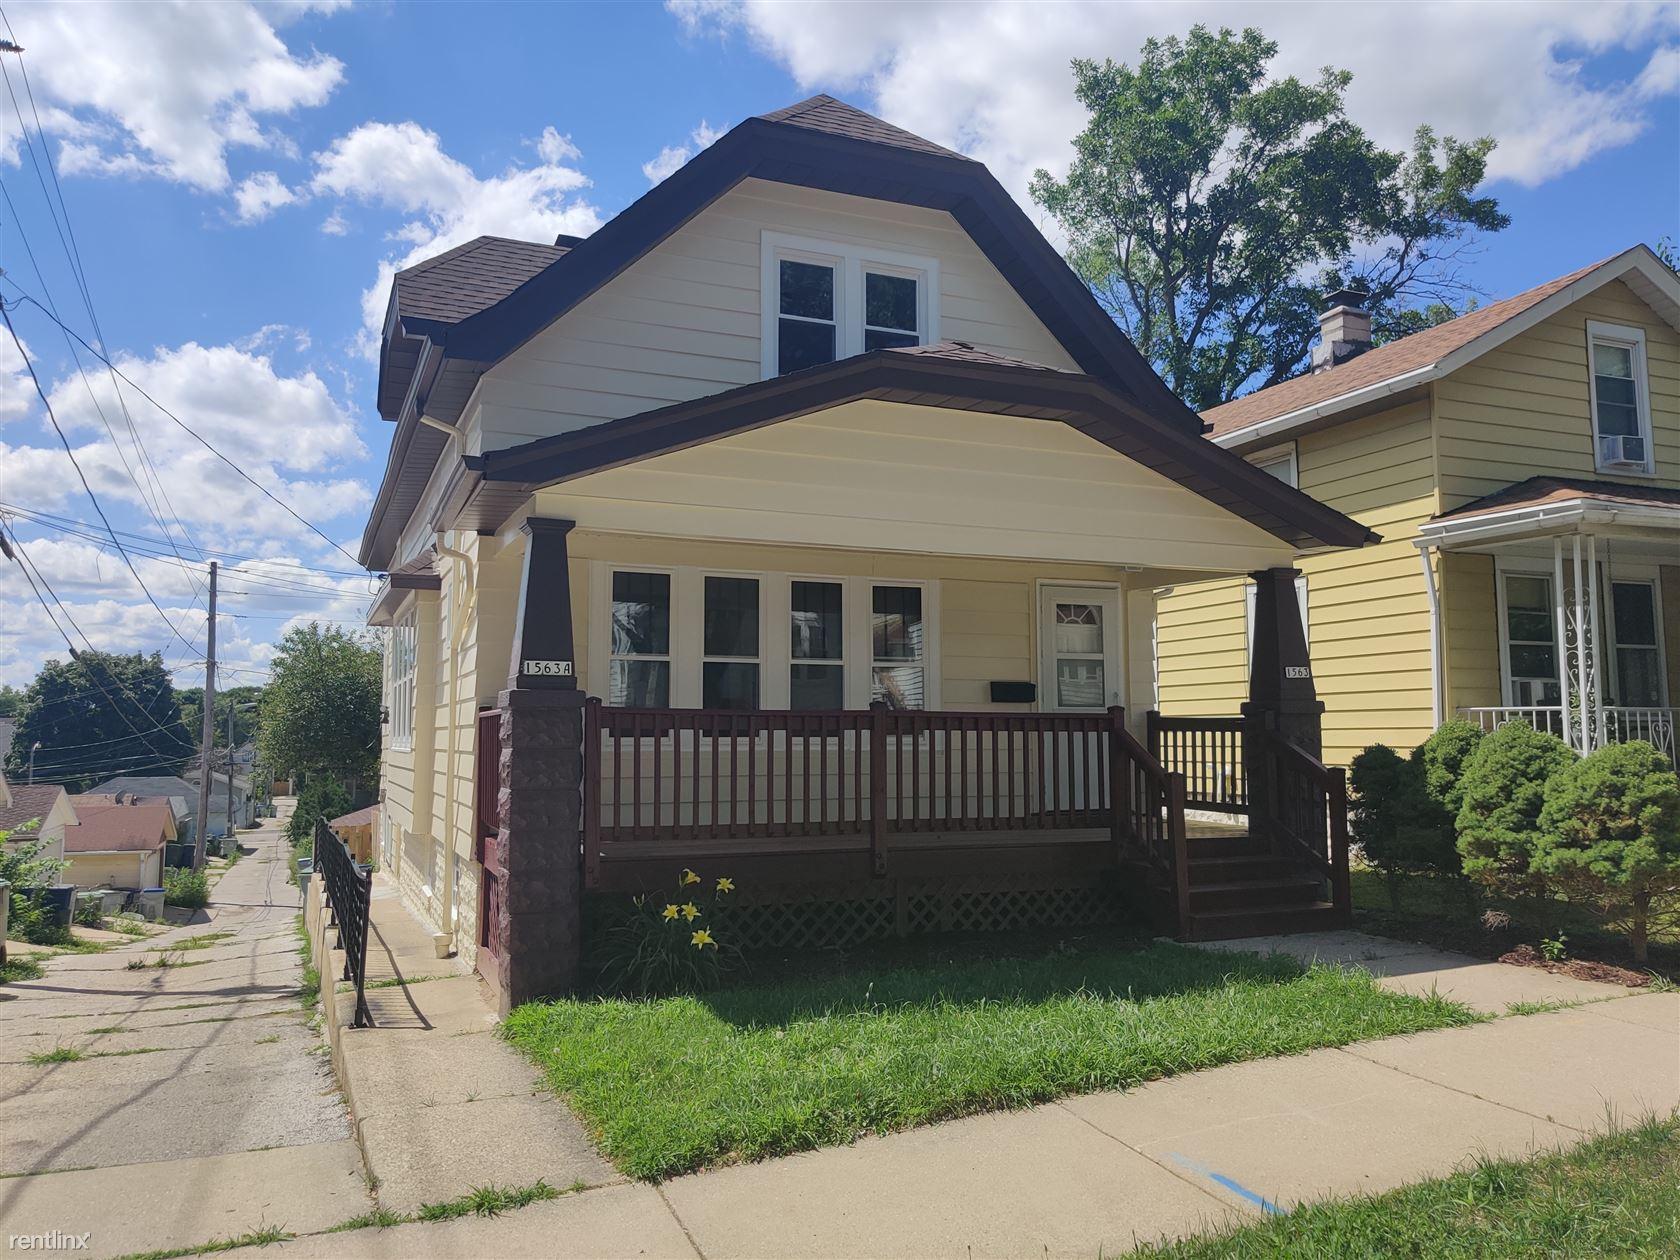 1563 S 33rd St Apt 1, Milwaukee, WI - $850